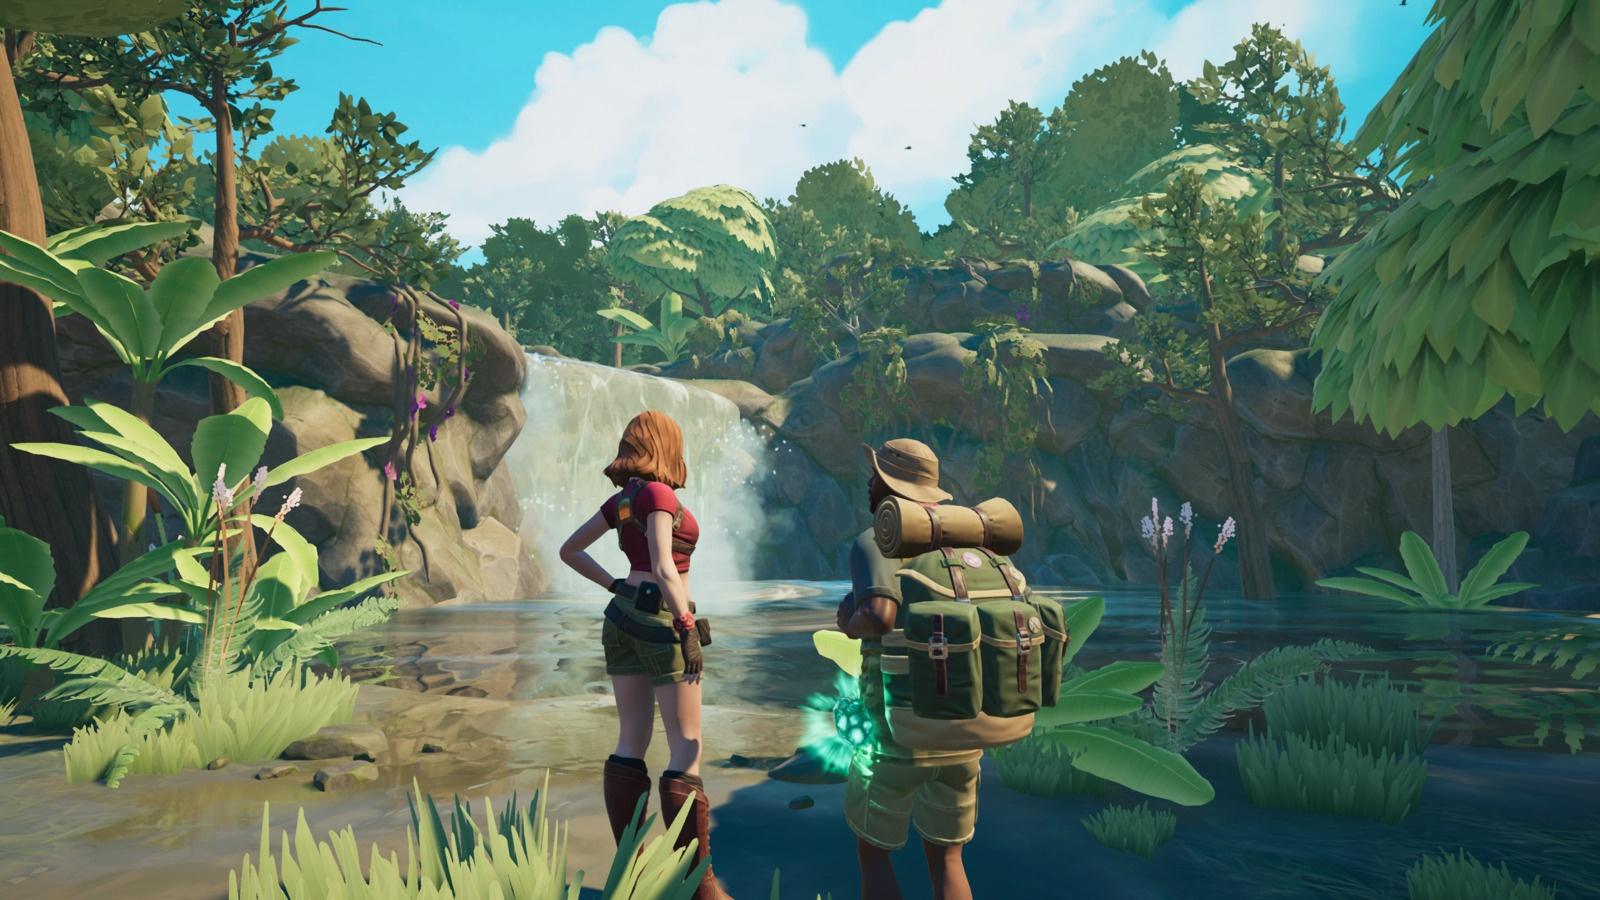 Состоялся релиз кооперативного боевика Jumanji: The Video Game